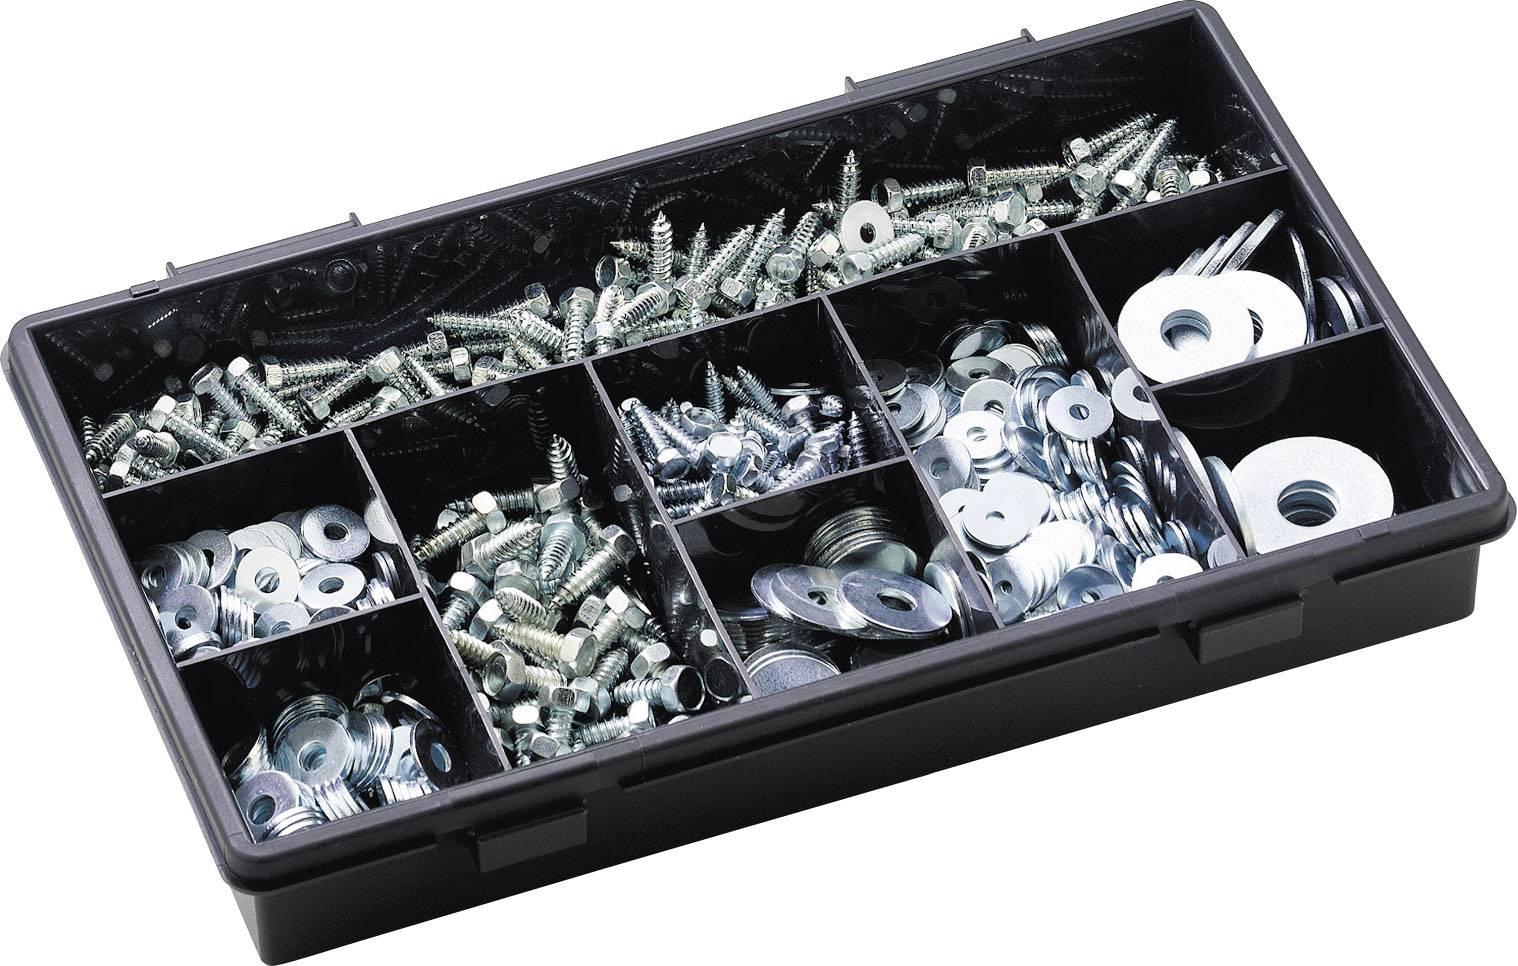 805-dílný sortiment šroubů apodložek do karoserie